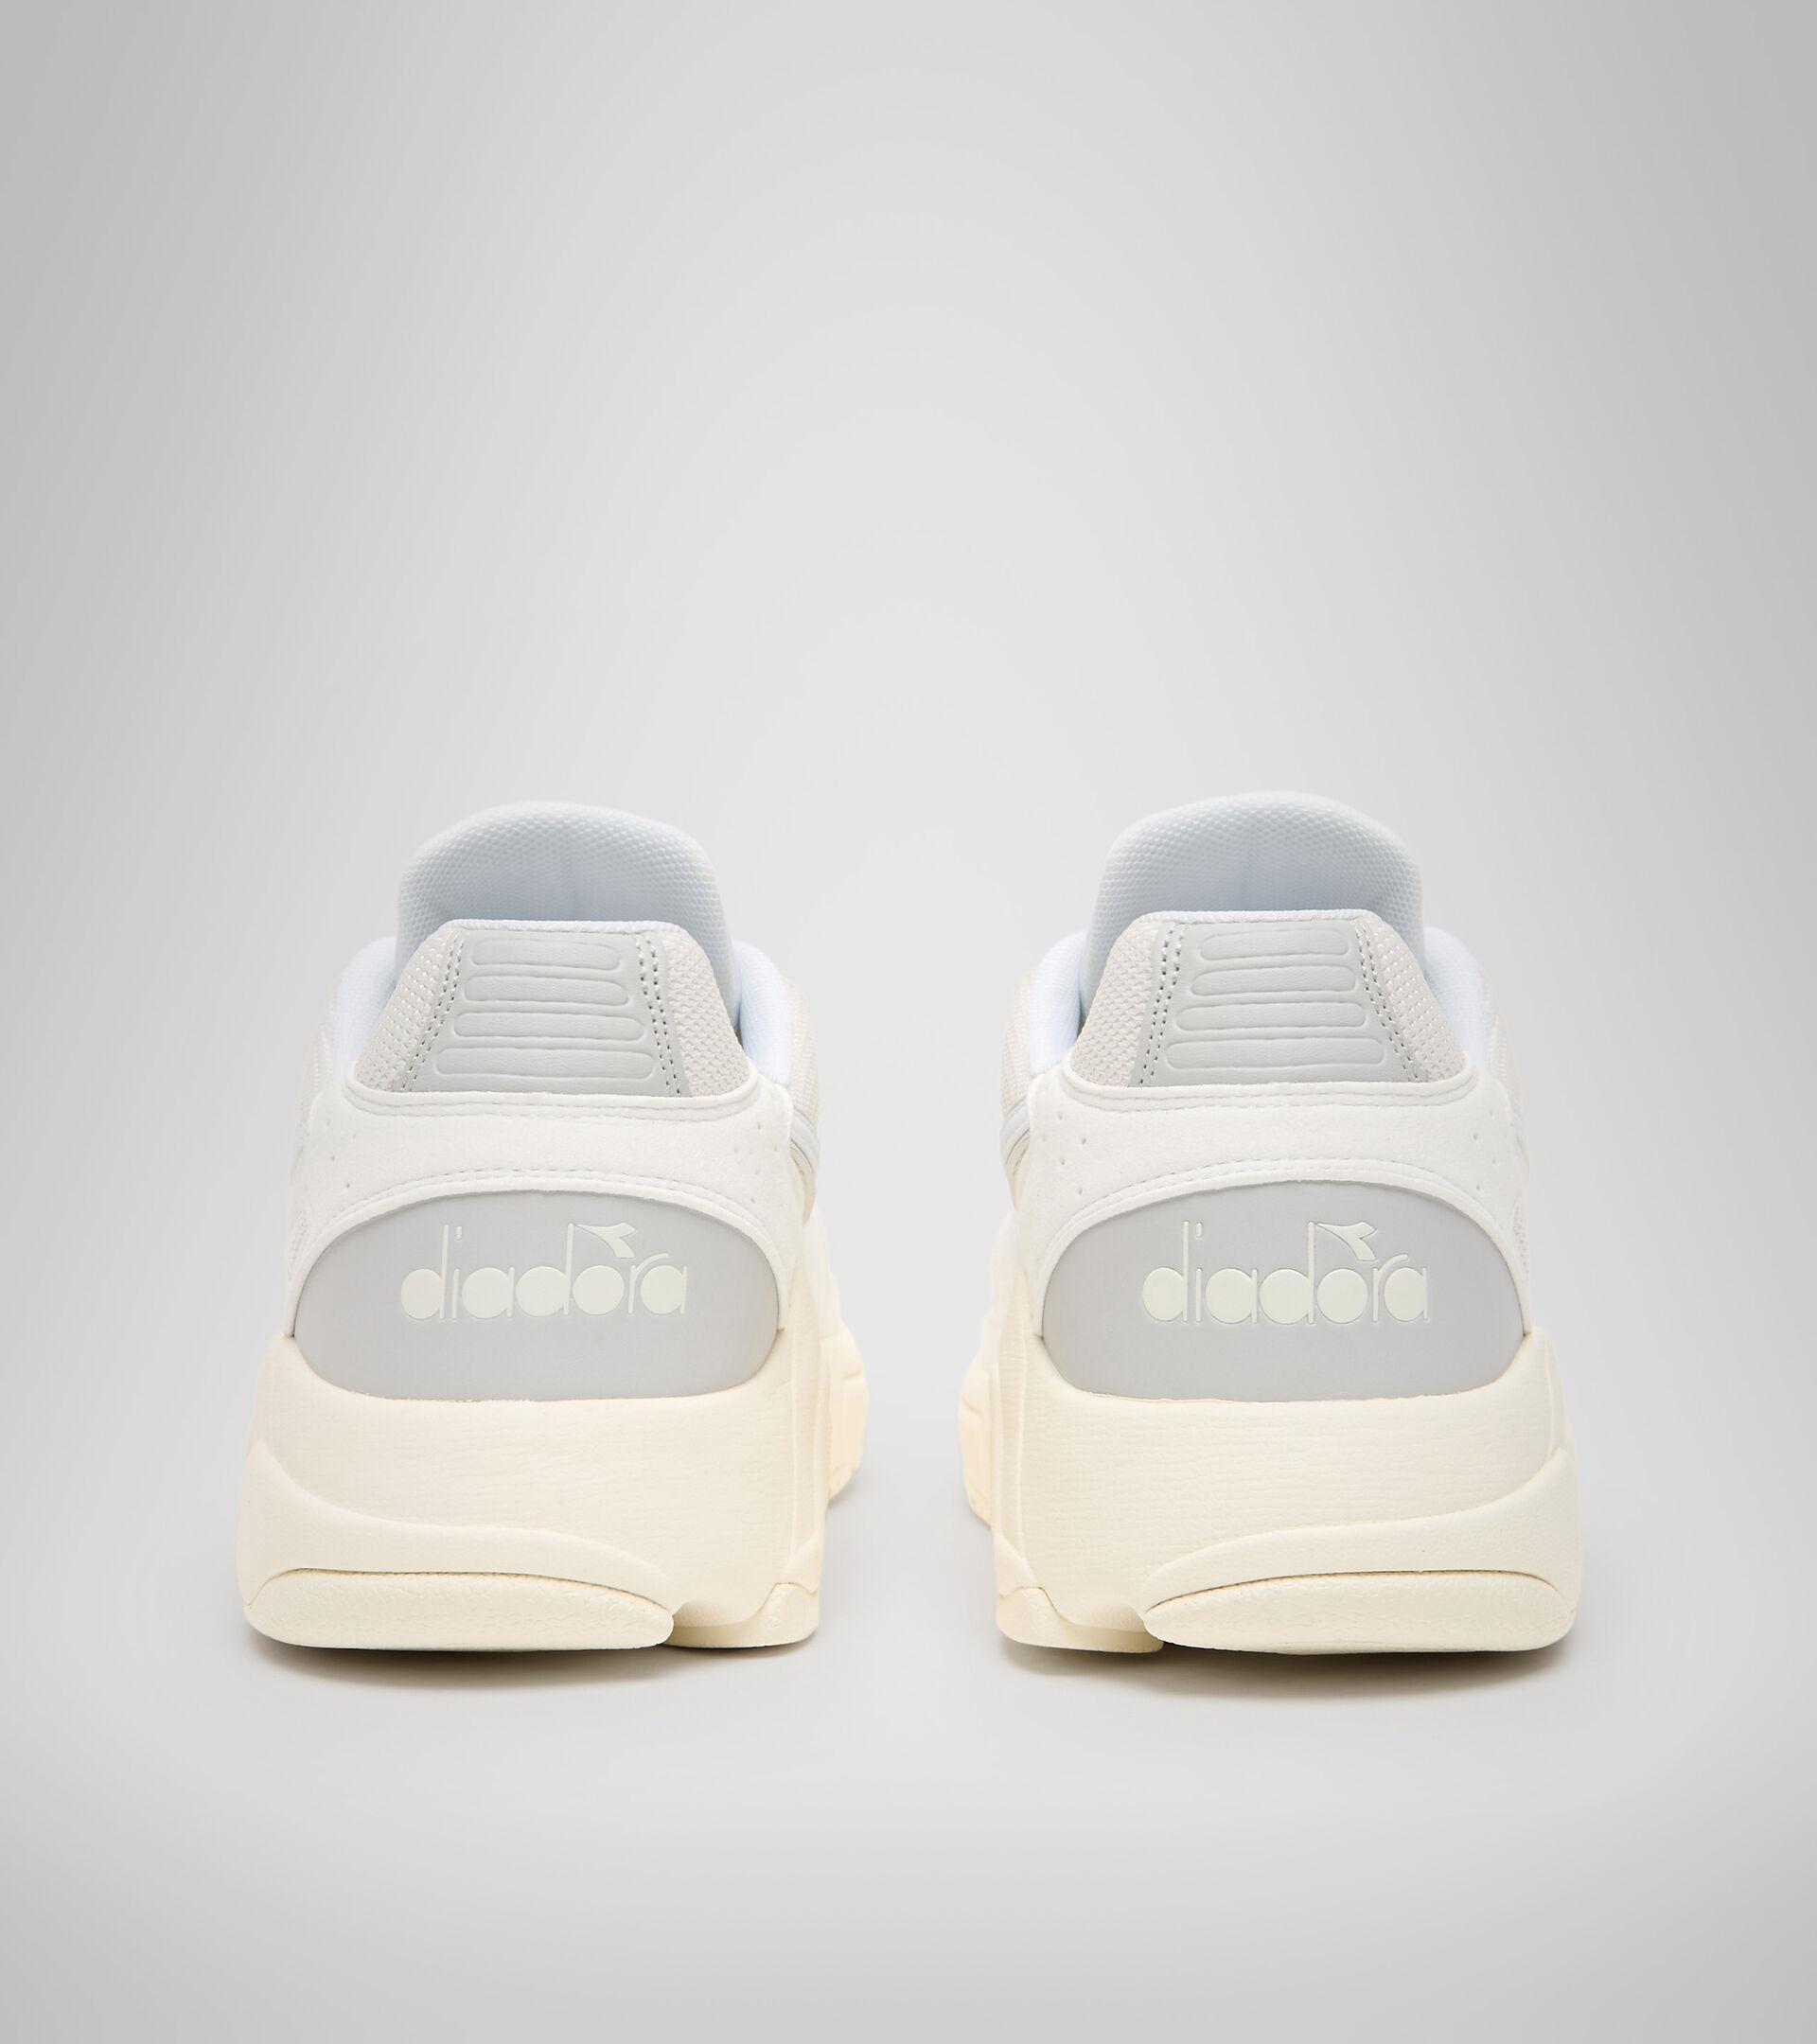 Footwear Sportswear UOMO MYTHOS SUEDE BLANCO/BLANCO/BLANCO MURMURAR Diadora